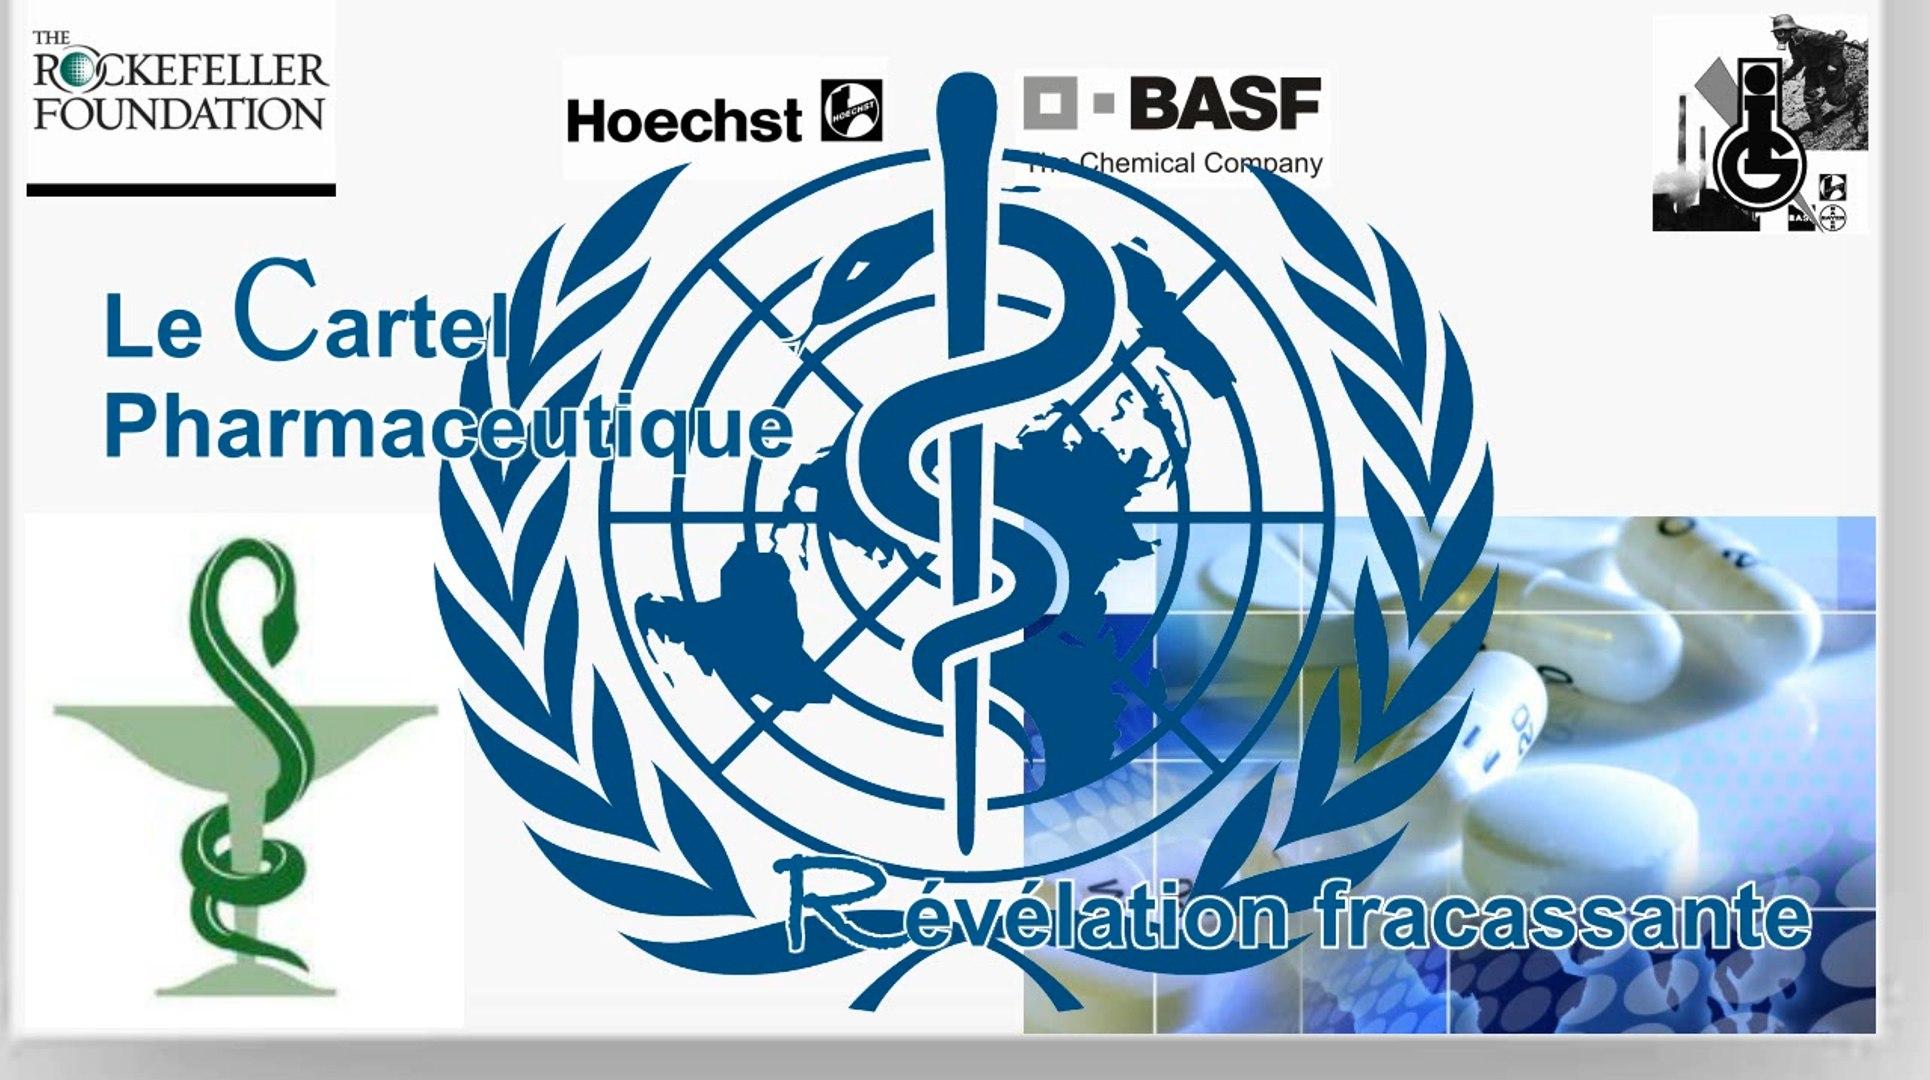 http://waskelil22.blogspot.com/2017/05/le-cartel-pharmaceutique-revelation_15.html